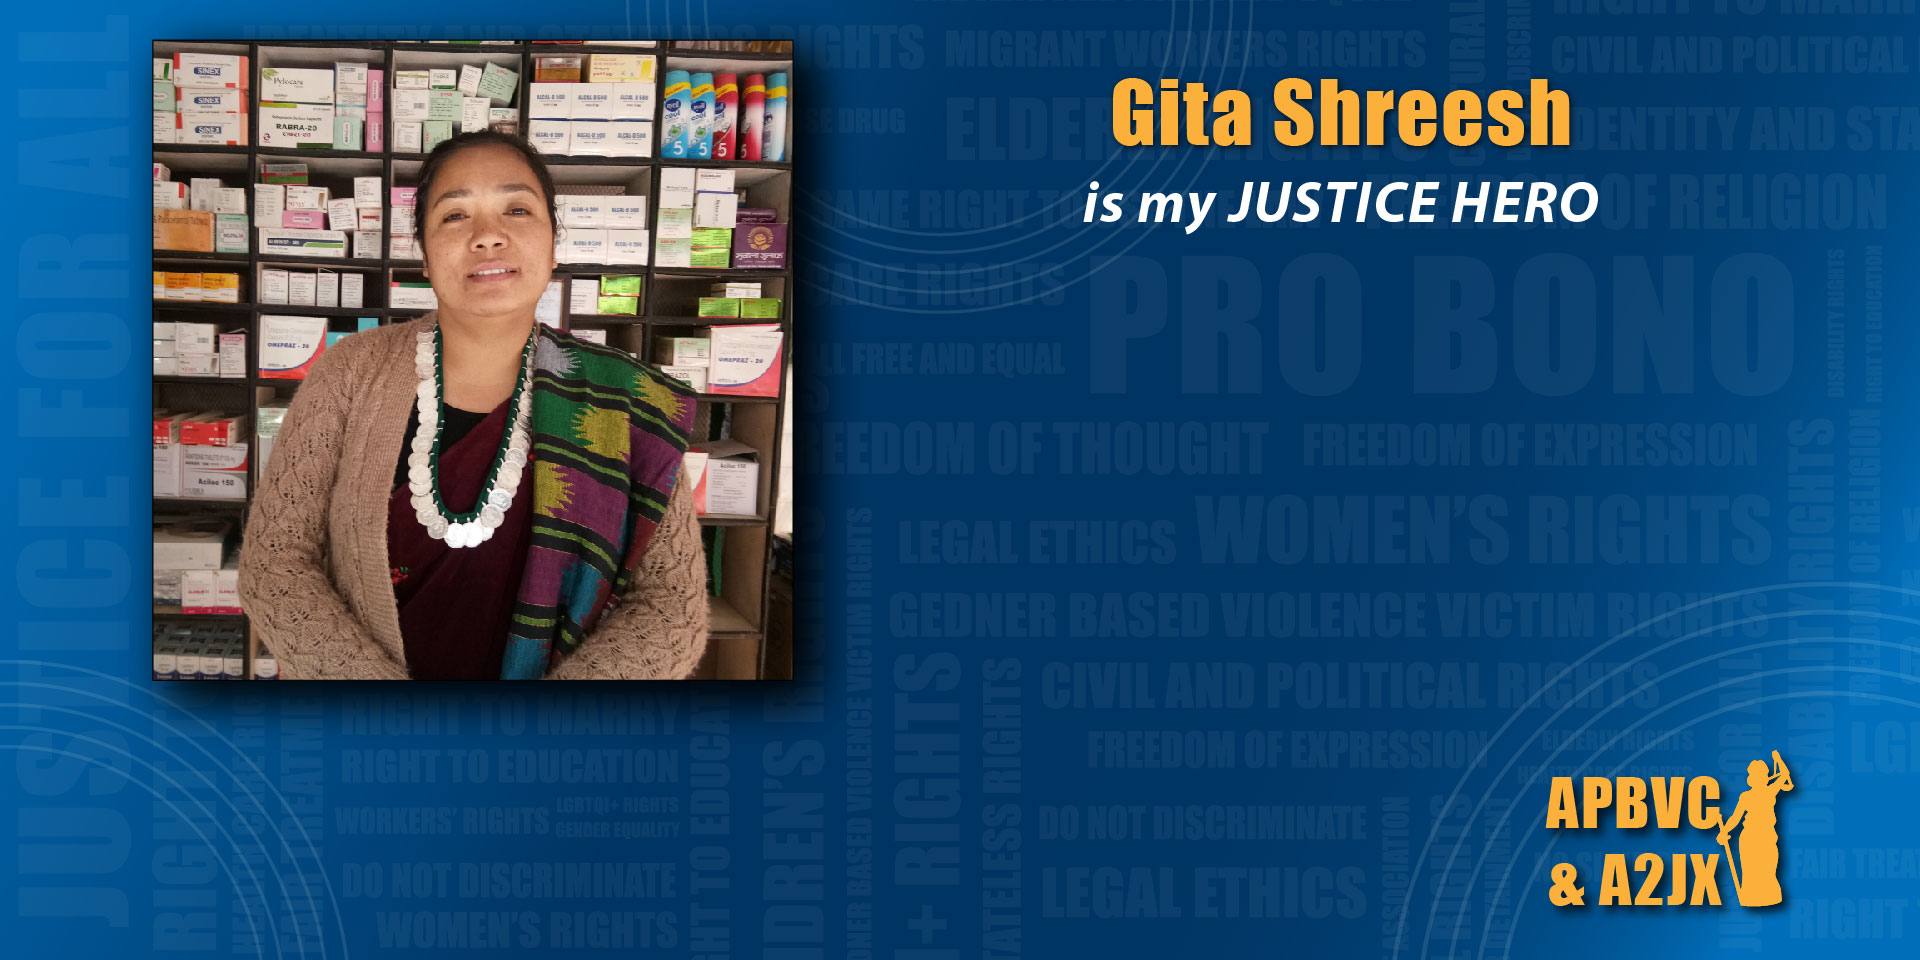 Gita Shreesh